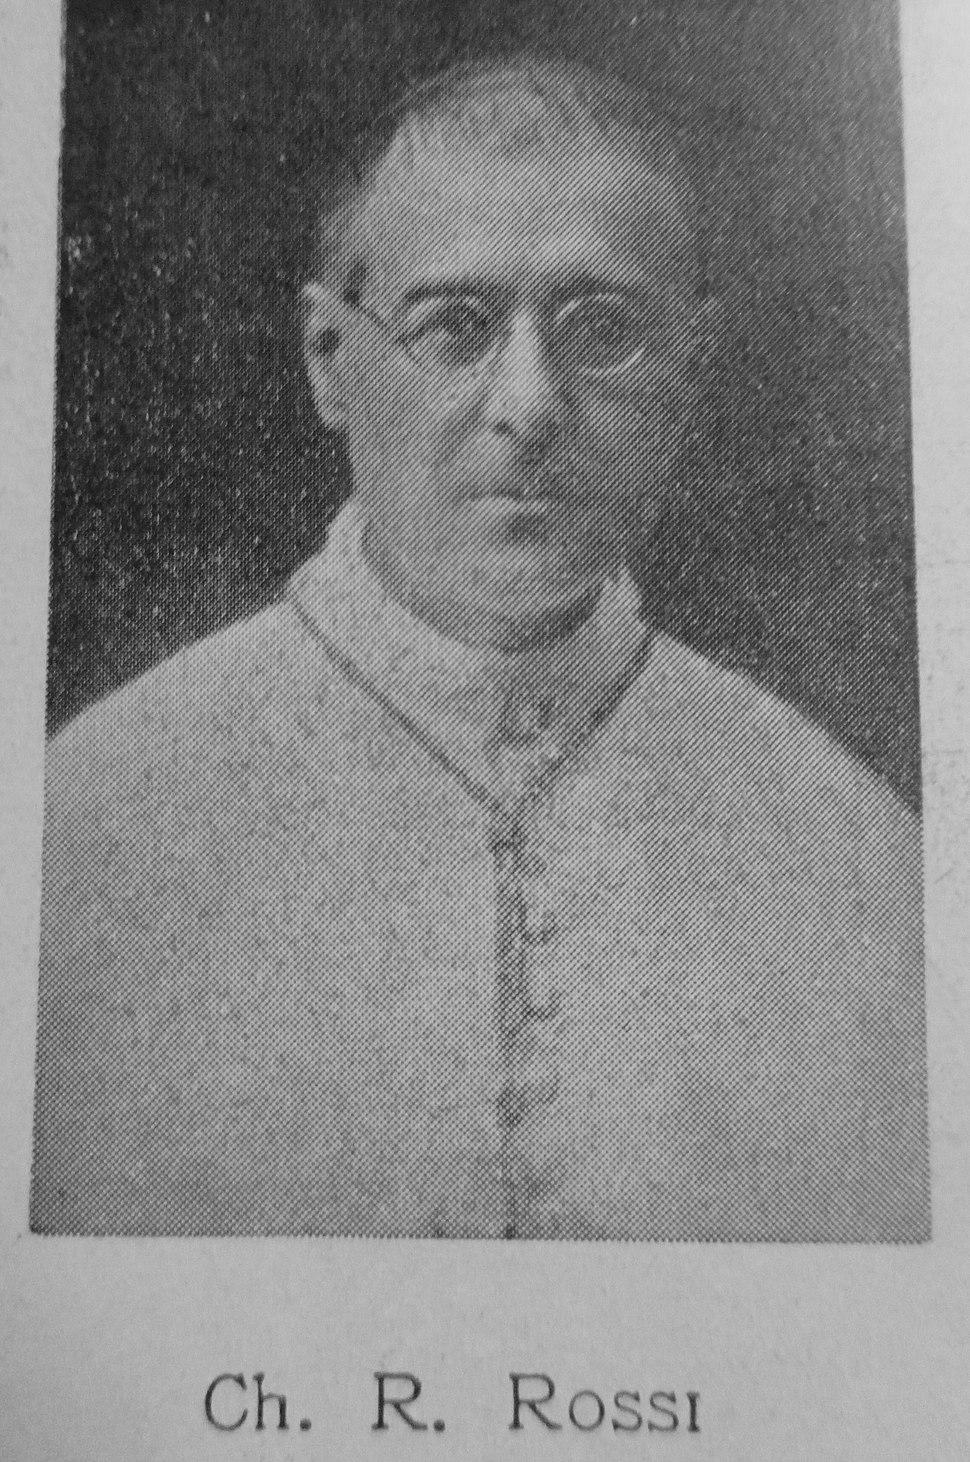 Cardinal Rossi